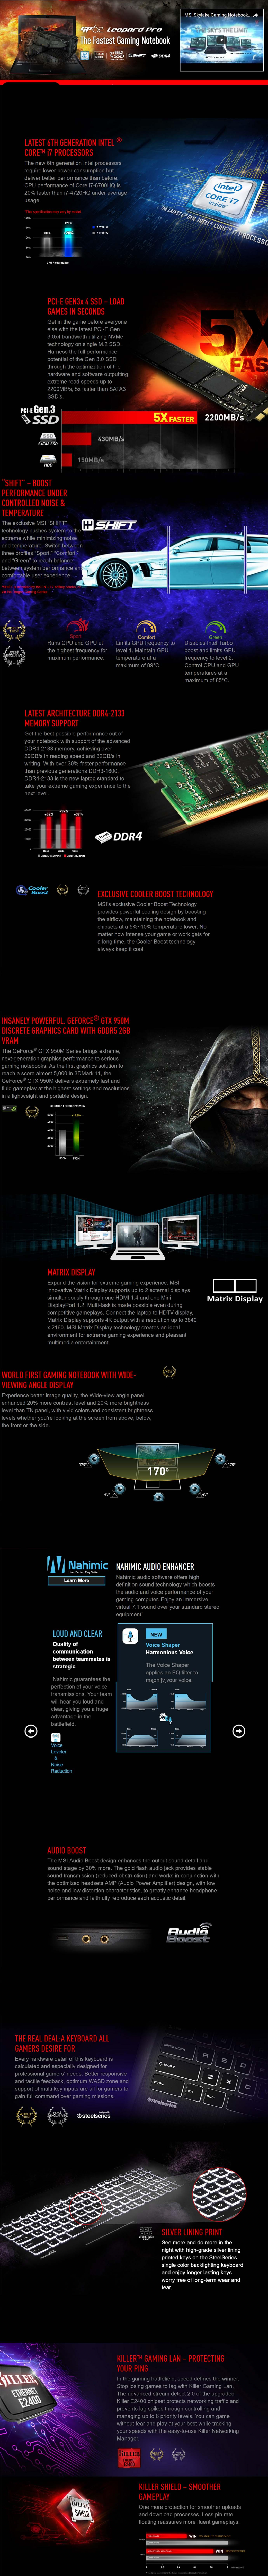 Dragon gaming center | Dragon Gaming Center version 1 0 1406 2601 by